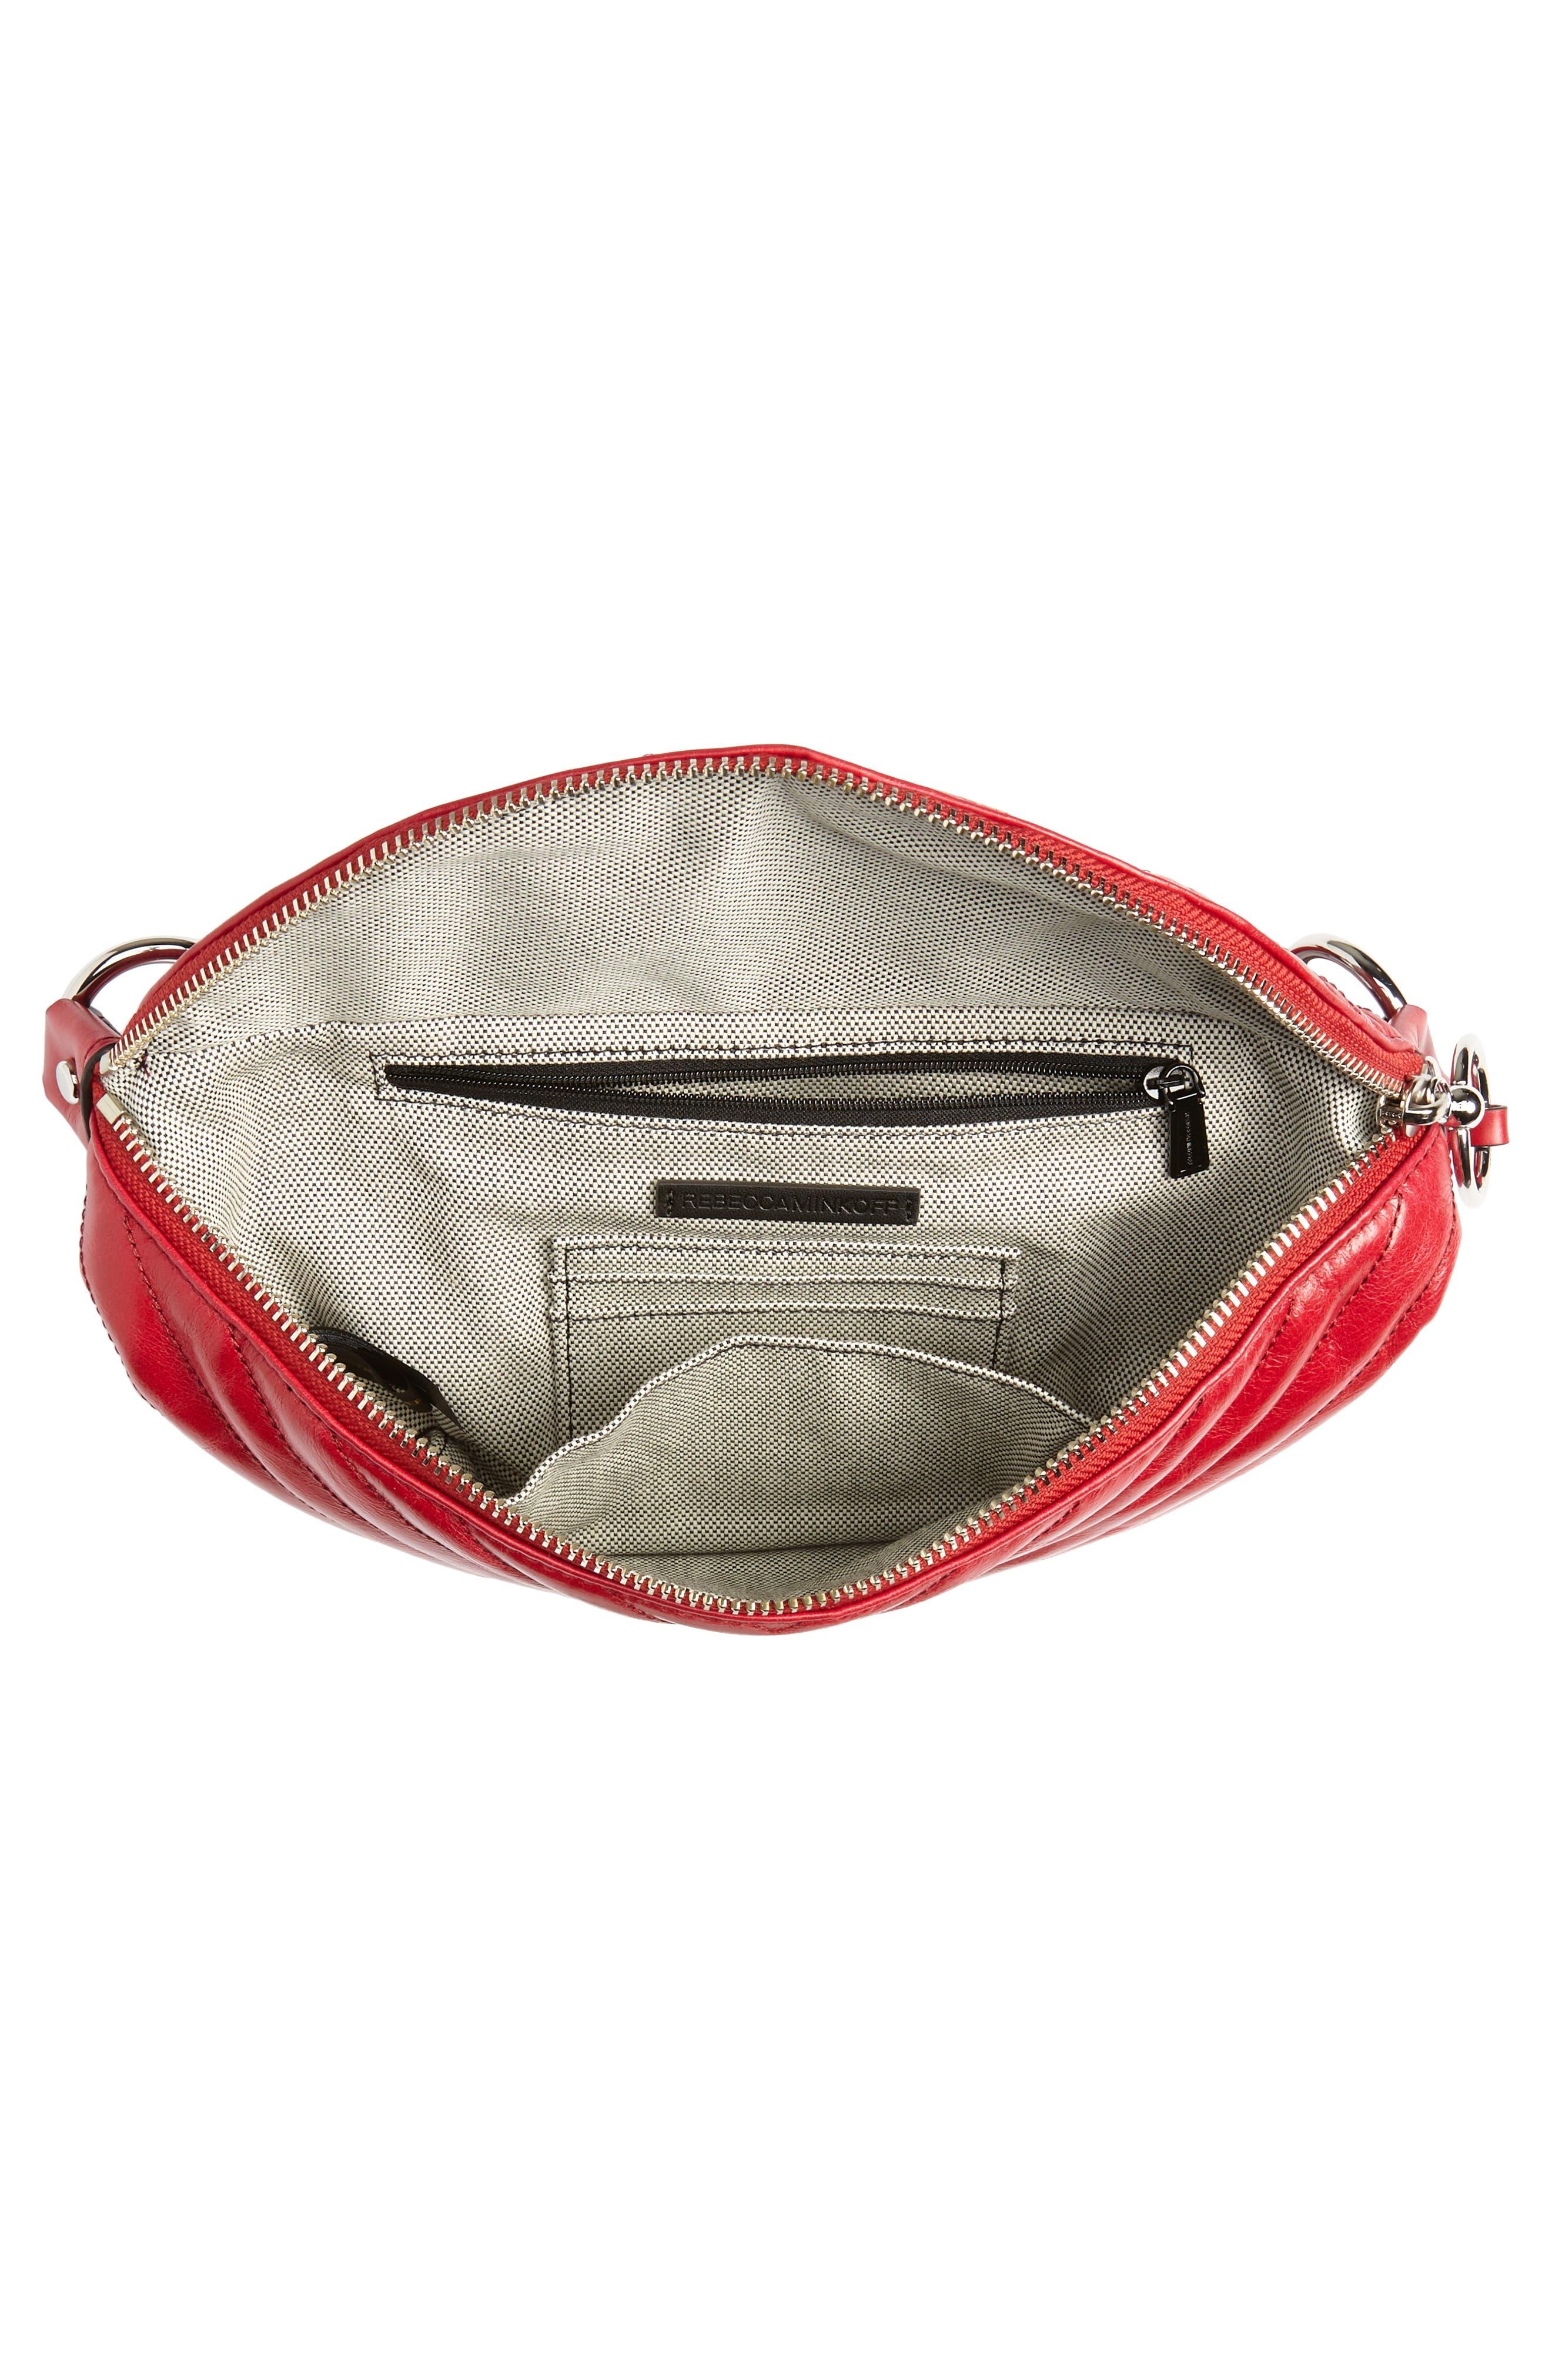 Edie Leather Belt Bag,                             Alternate thumbnail 5, color,                             SCARLET